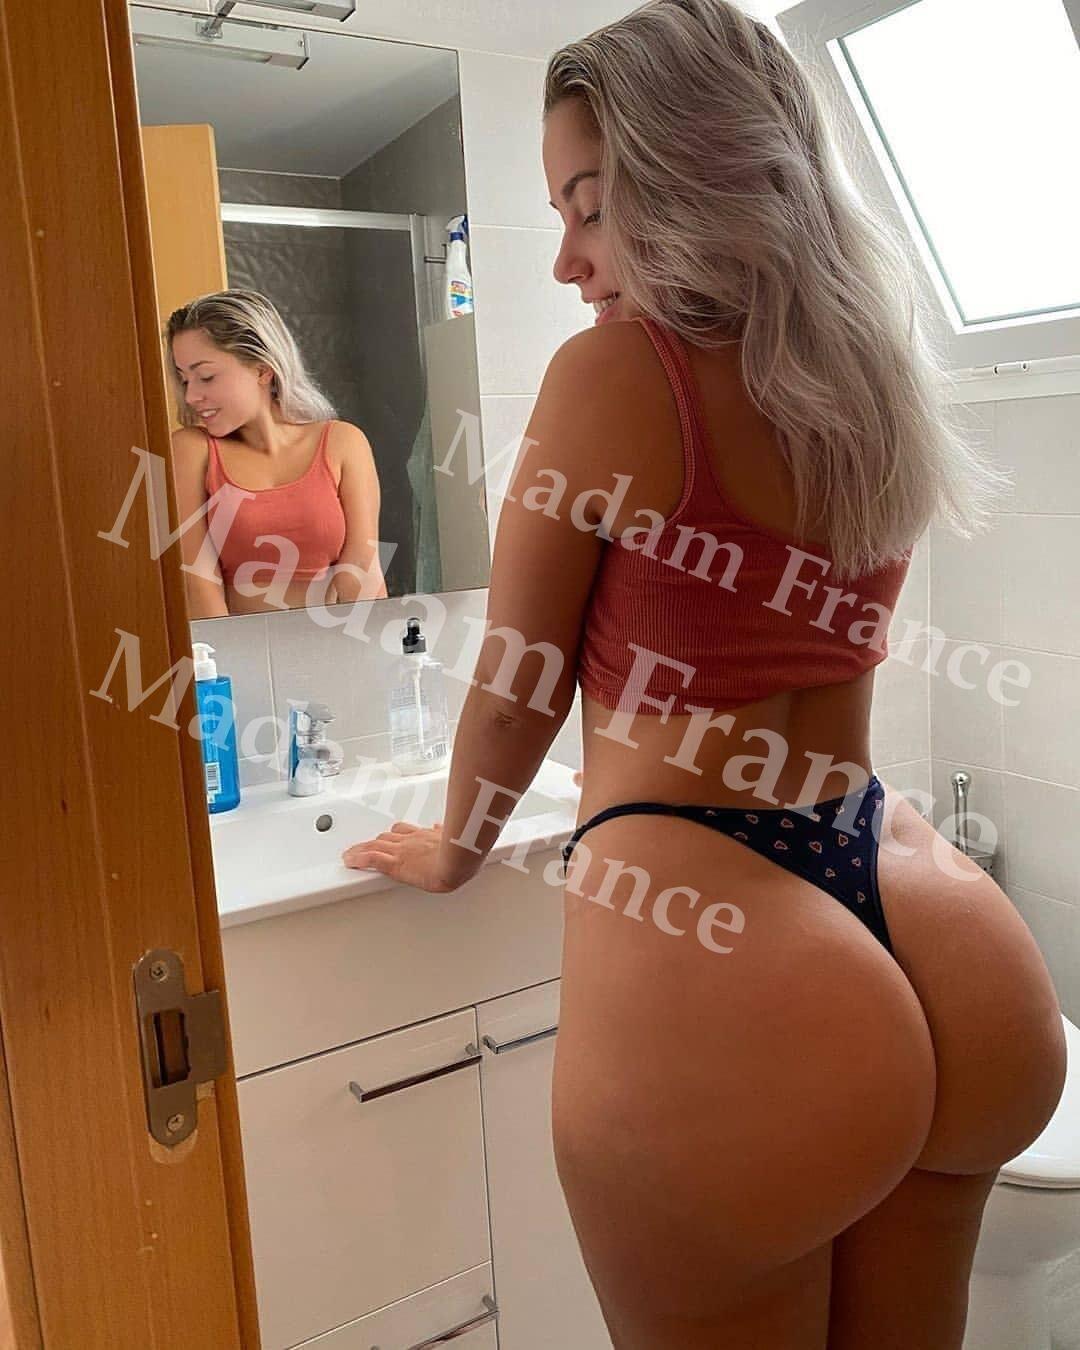 justinee model on Madam France escort service